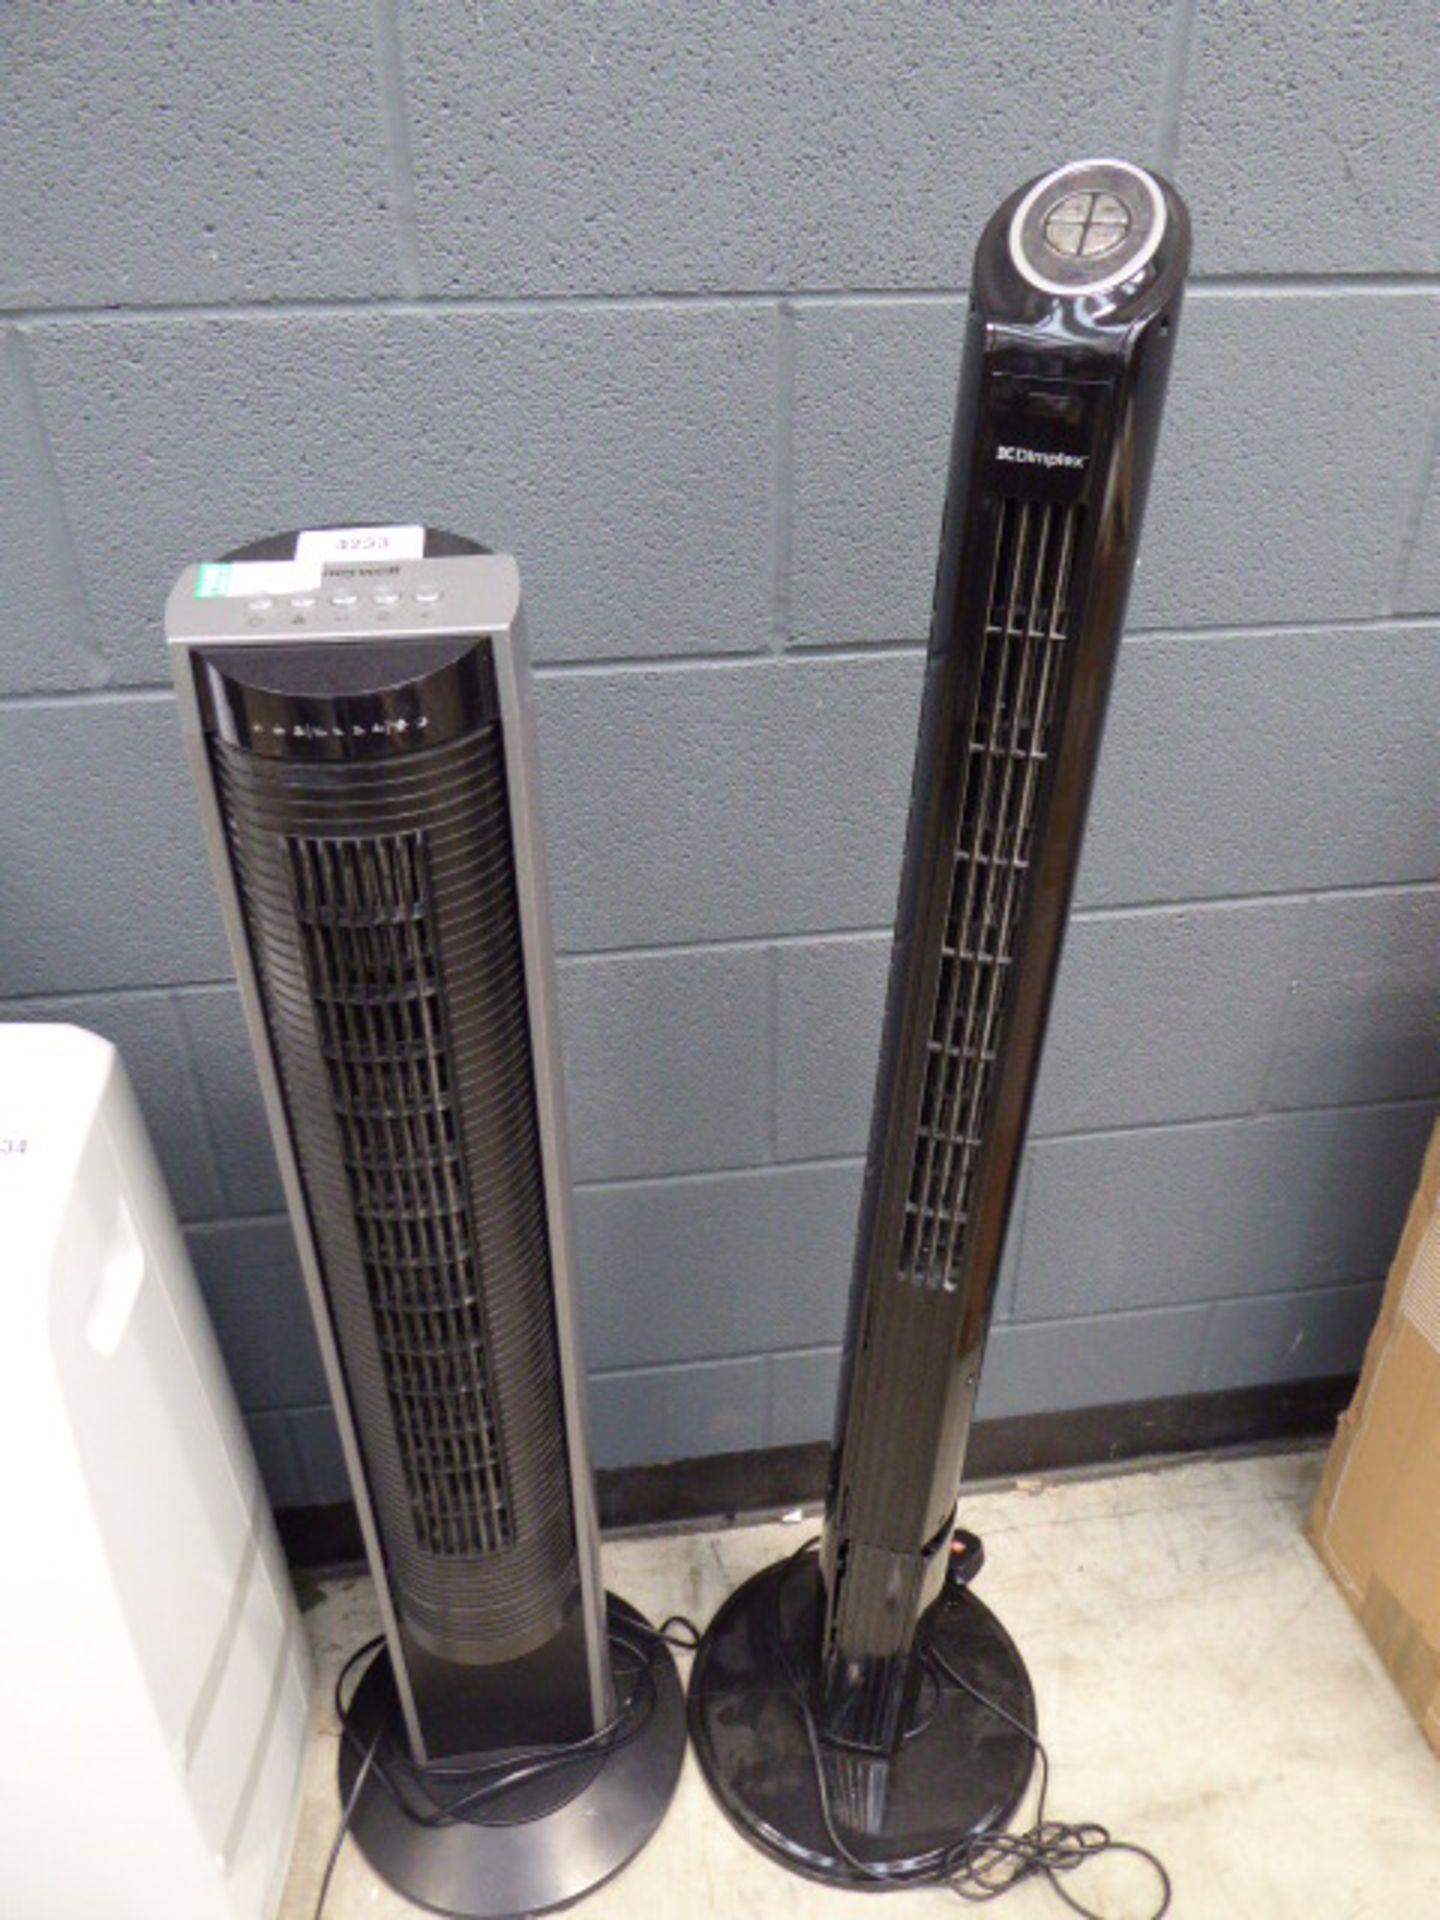 Honeywell and a Dimplex fan heater